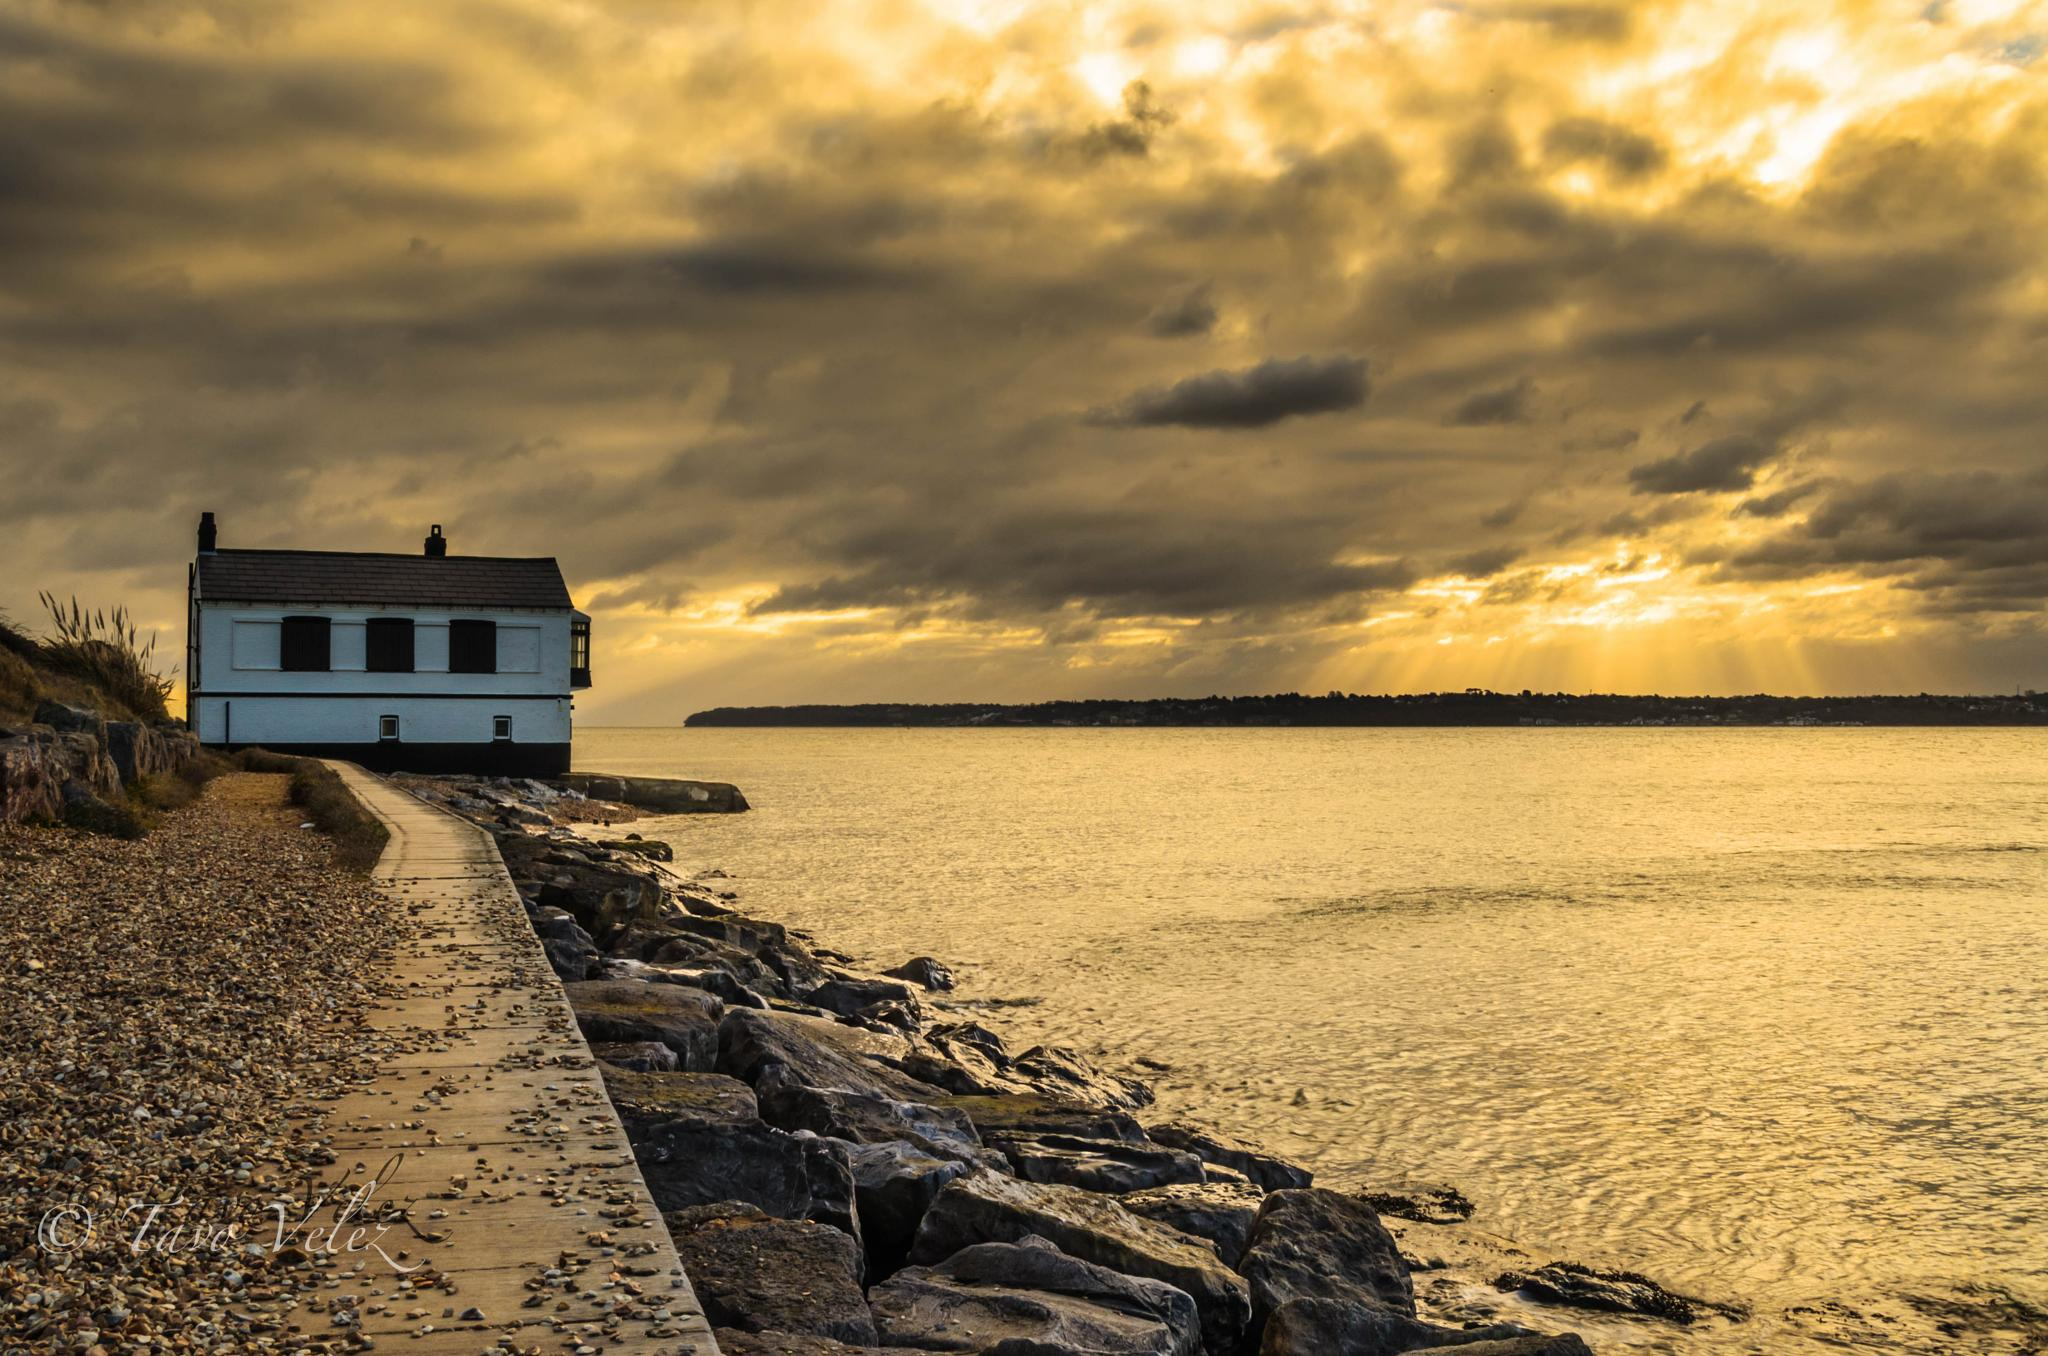 sunrise over the beach house lepe by Tavo